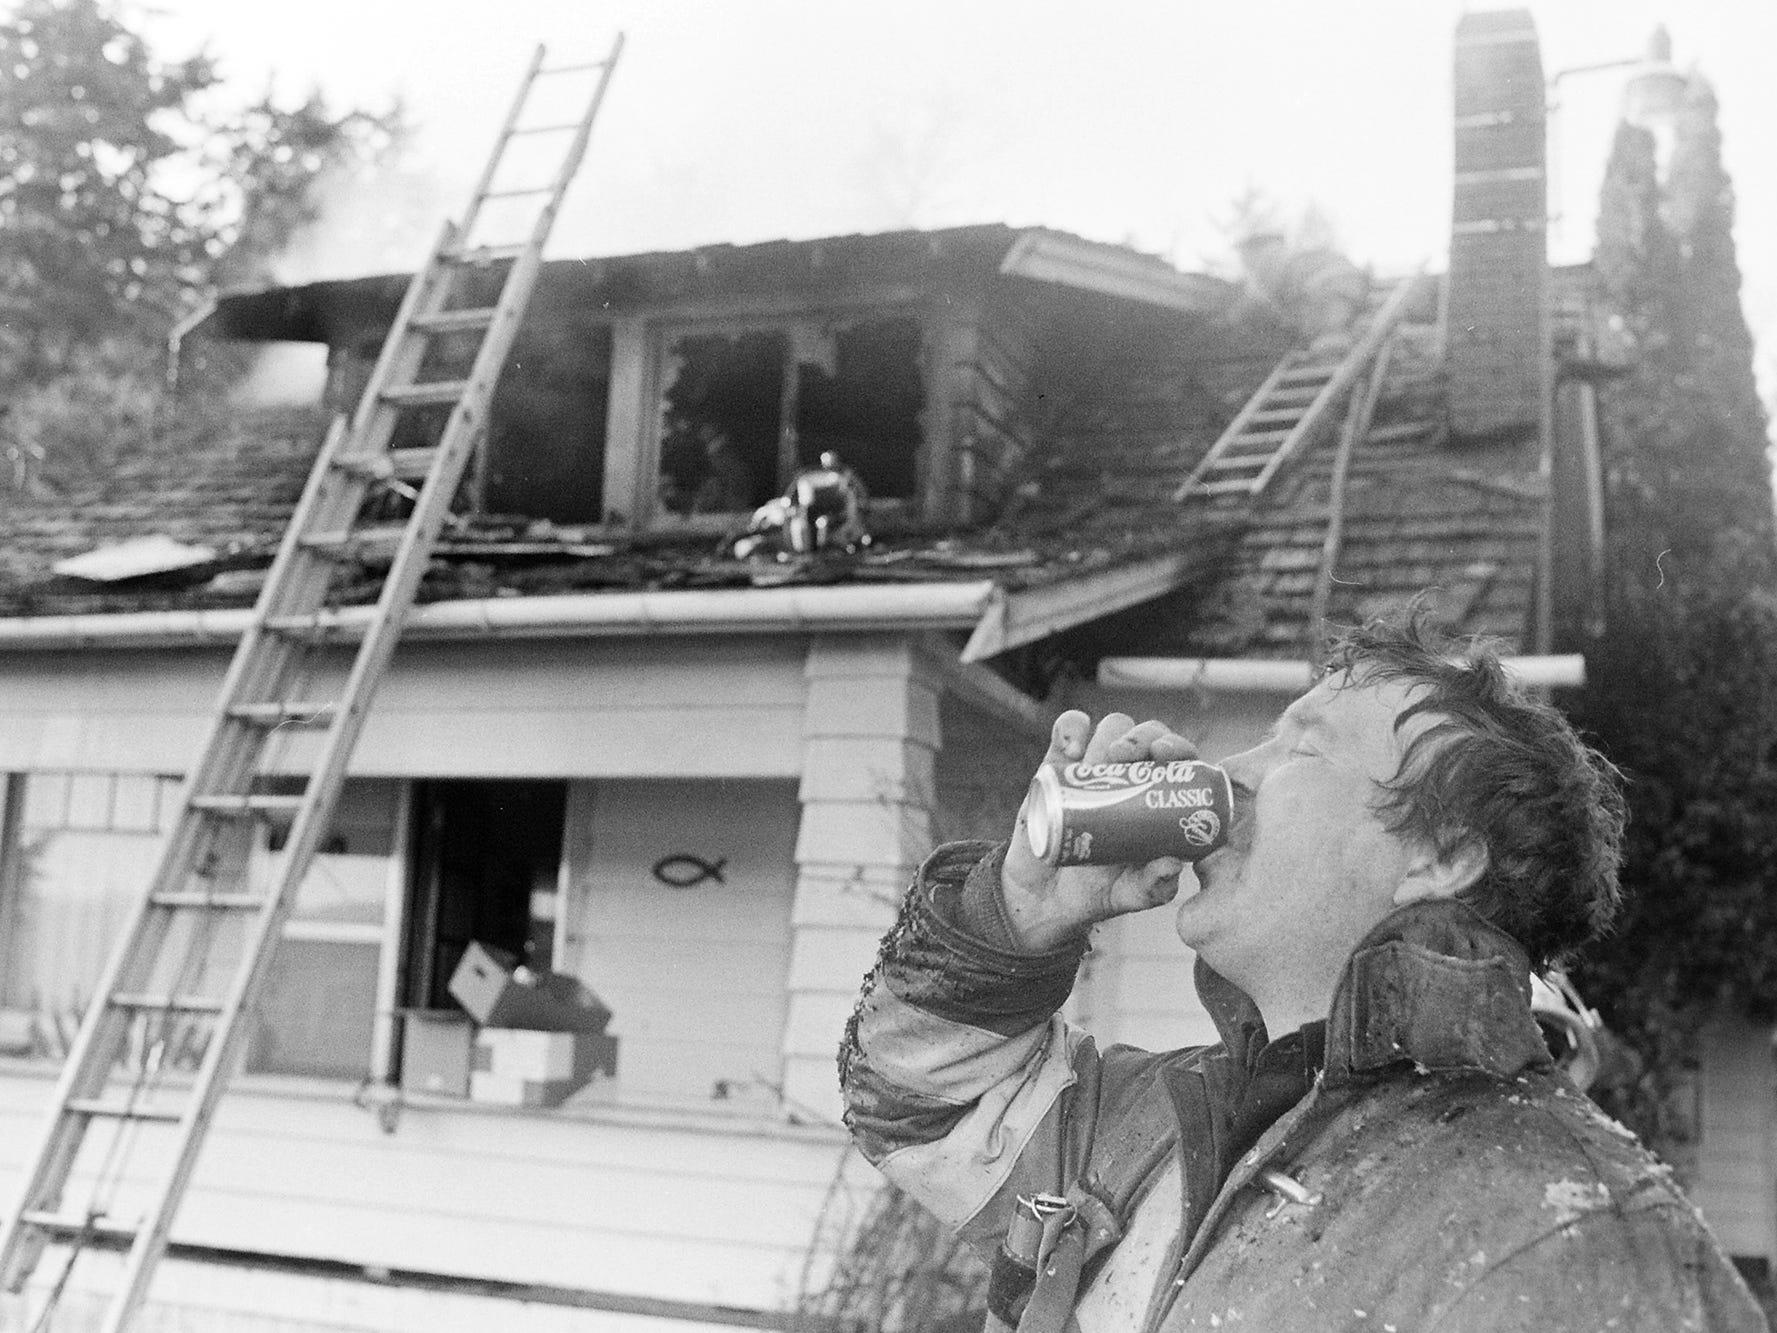 02/23/90House Fire